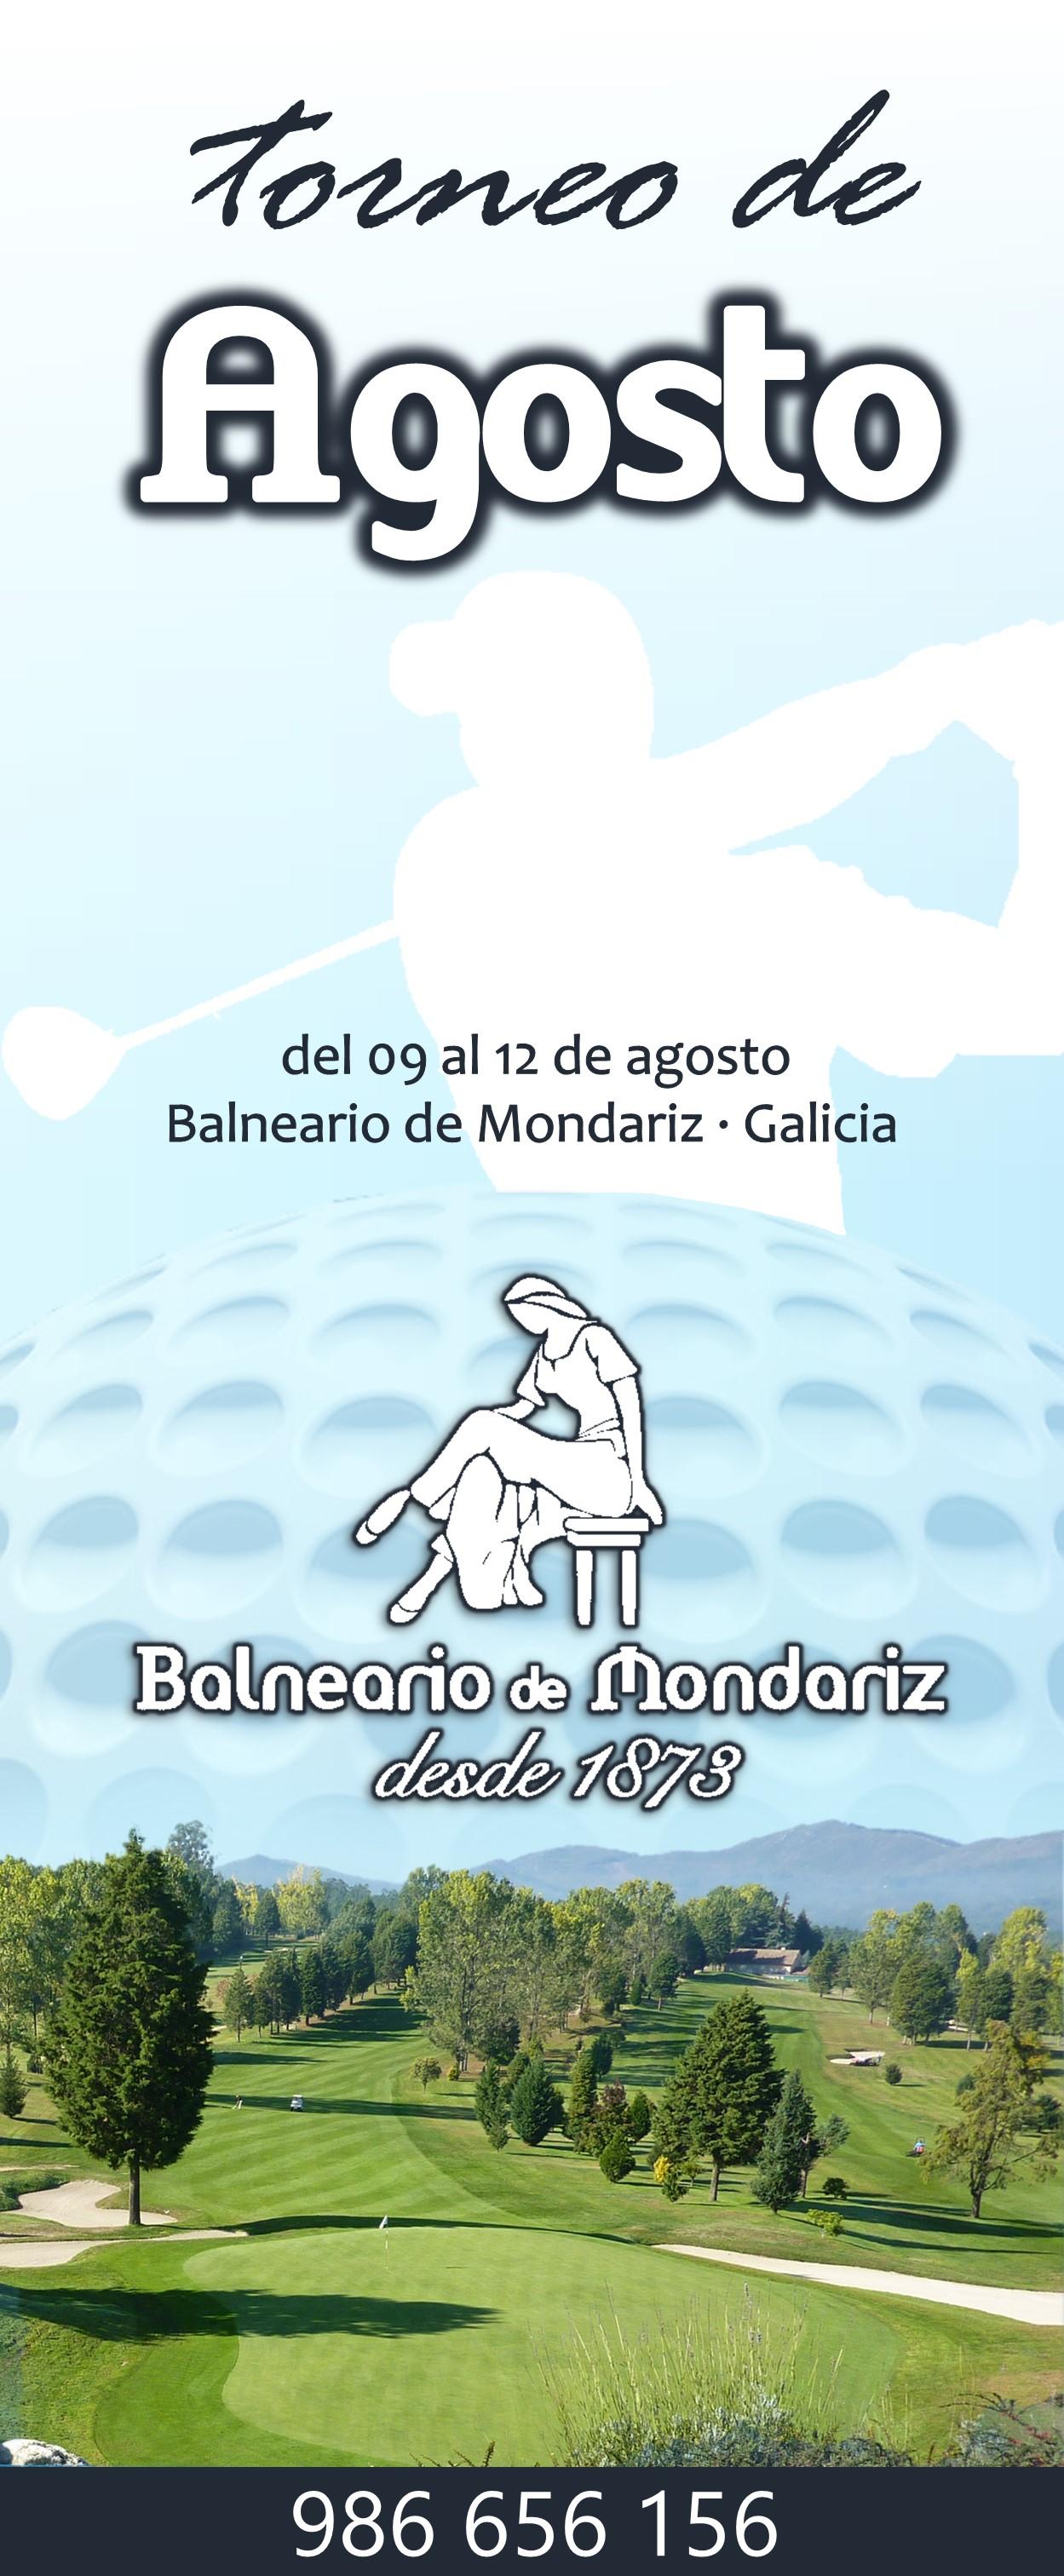 https://www.mistorneosdegolf.com/torneos/1301/torneo-puente-de-agosto-